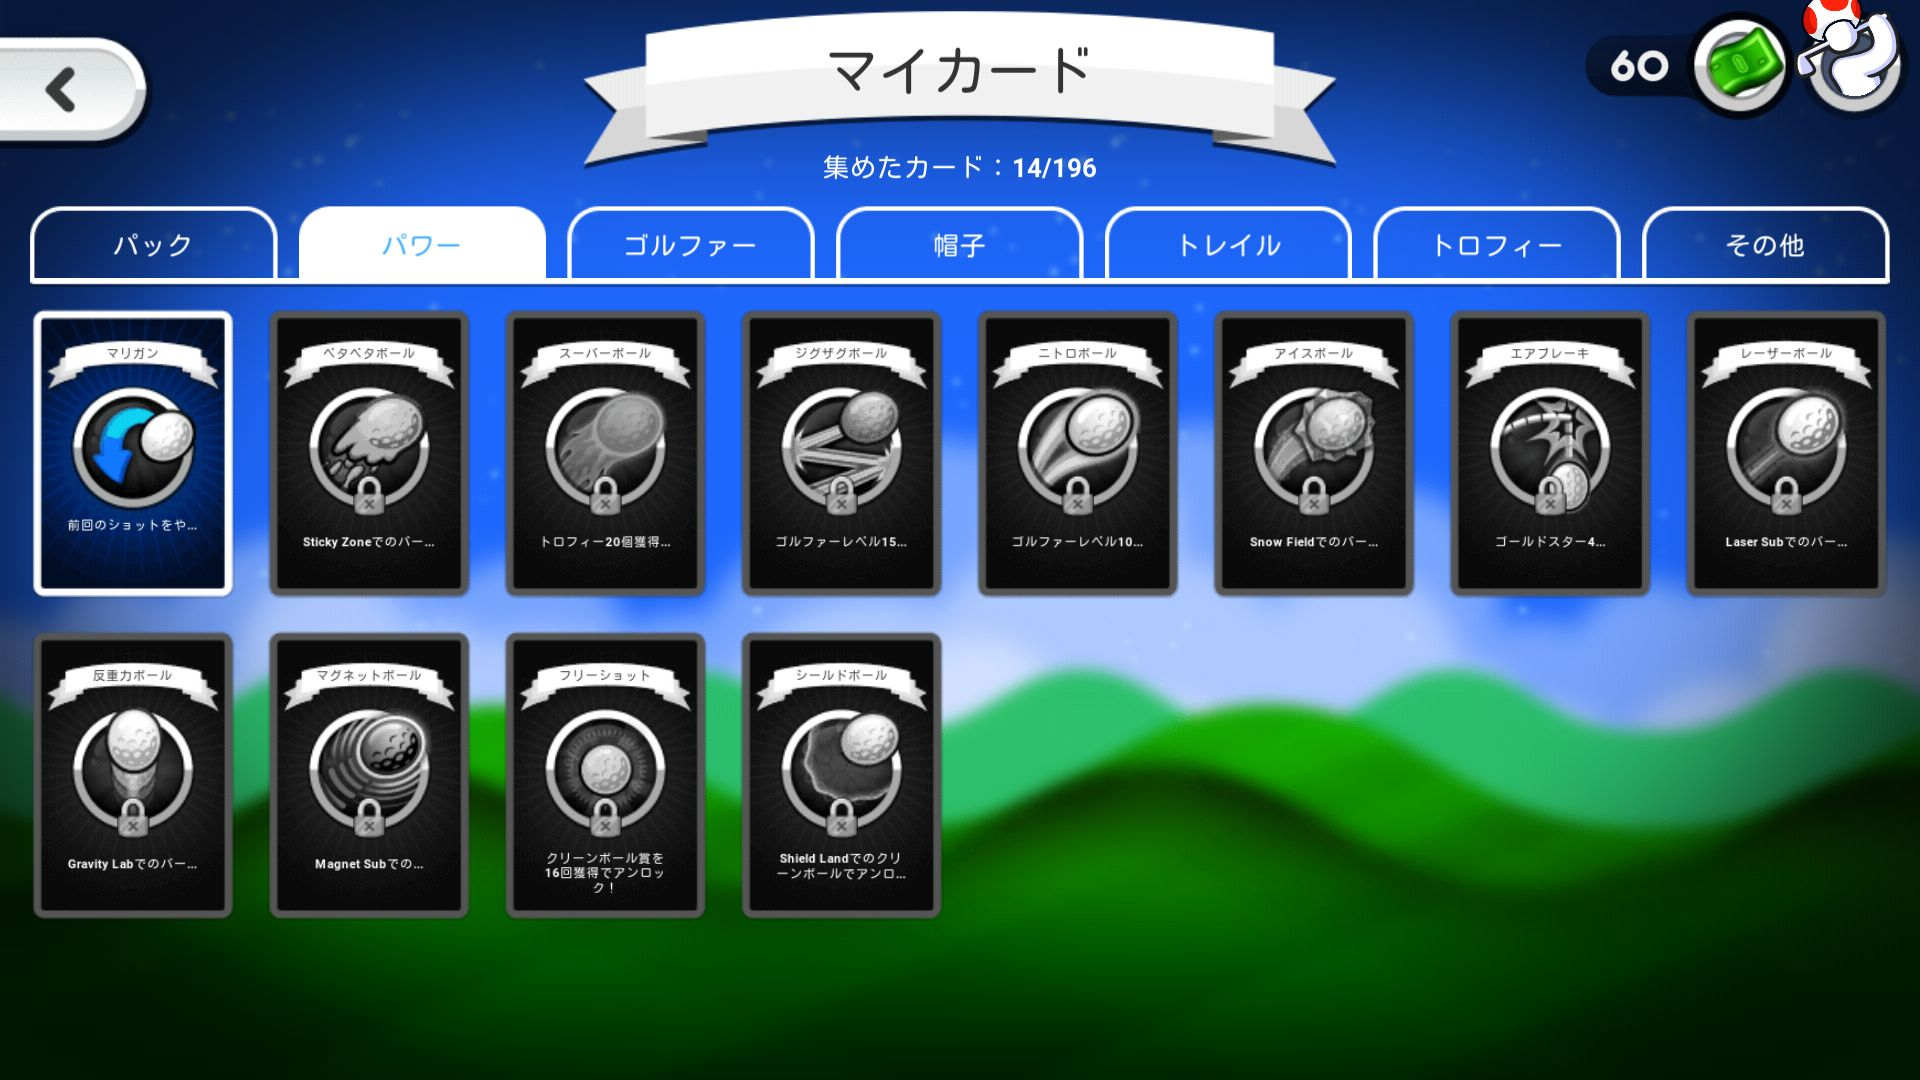 androidアプリ Super Stickman Golf 3攻略スクリーンショット5